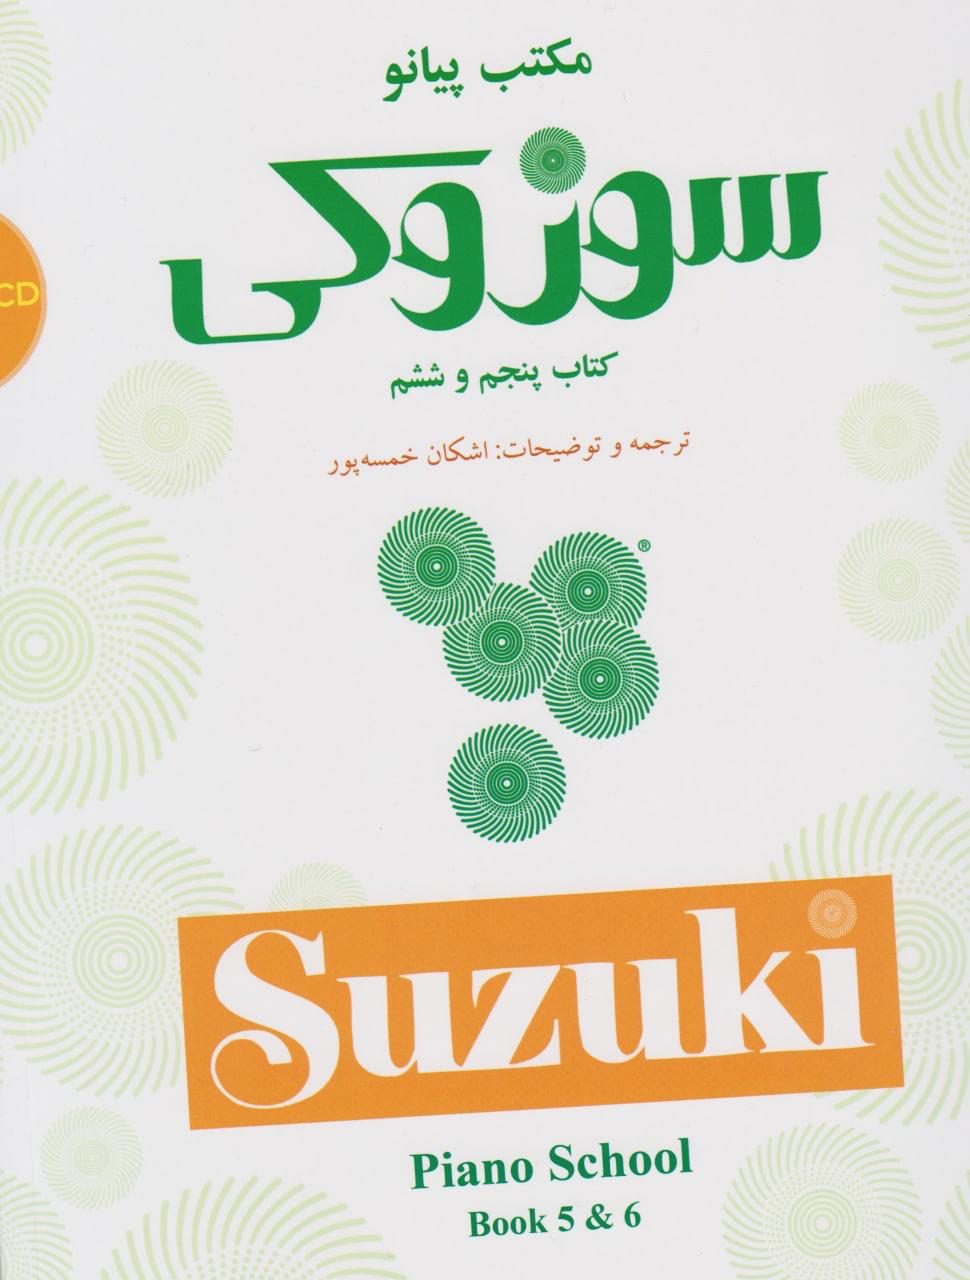 کتاب پنجم و ششم مکتب پیانو سوزوکی اشکان خمسهپور انتشارات سرود